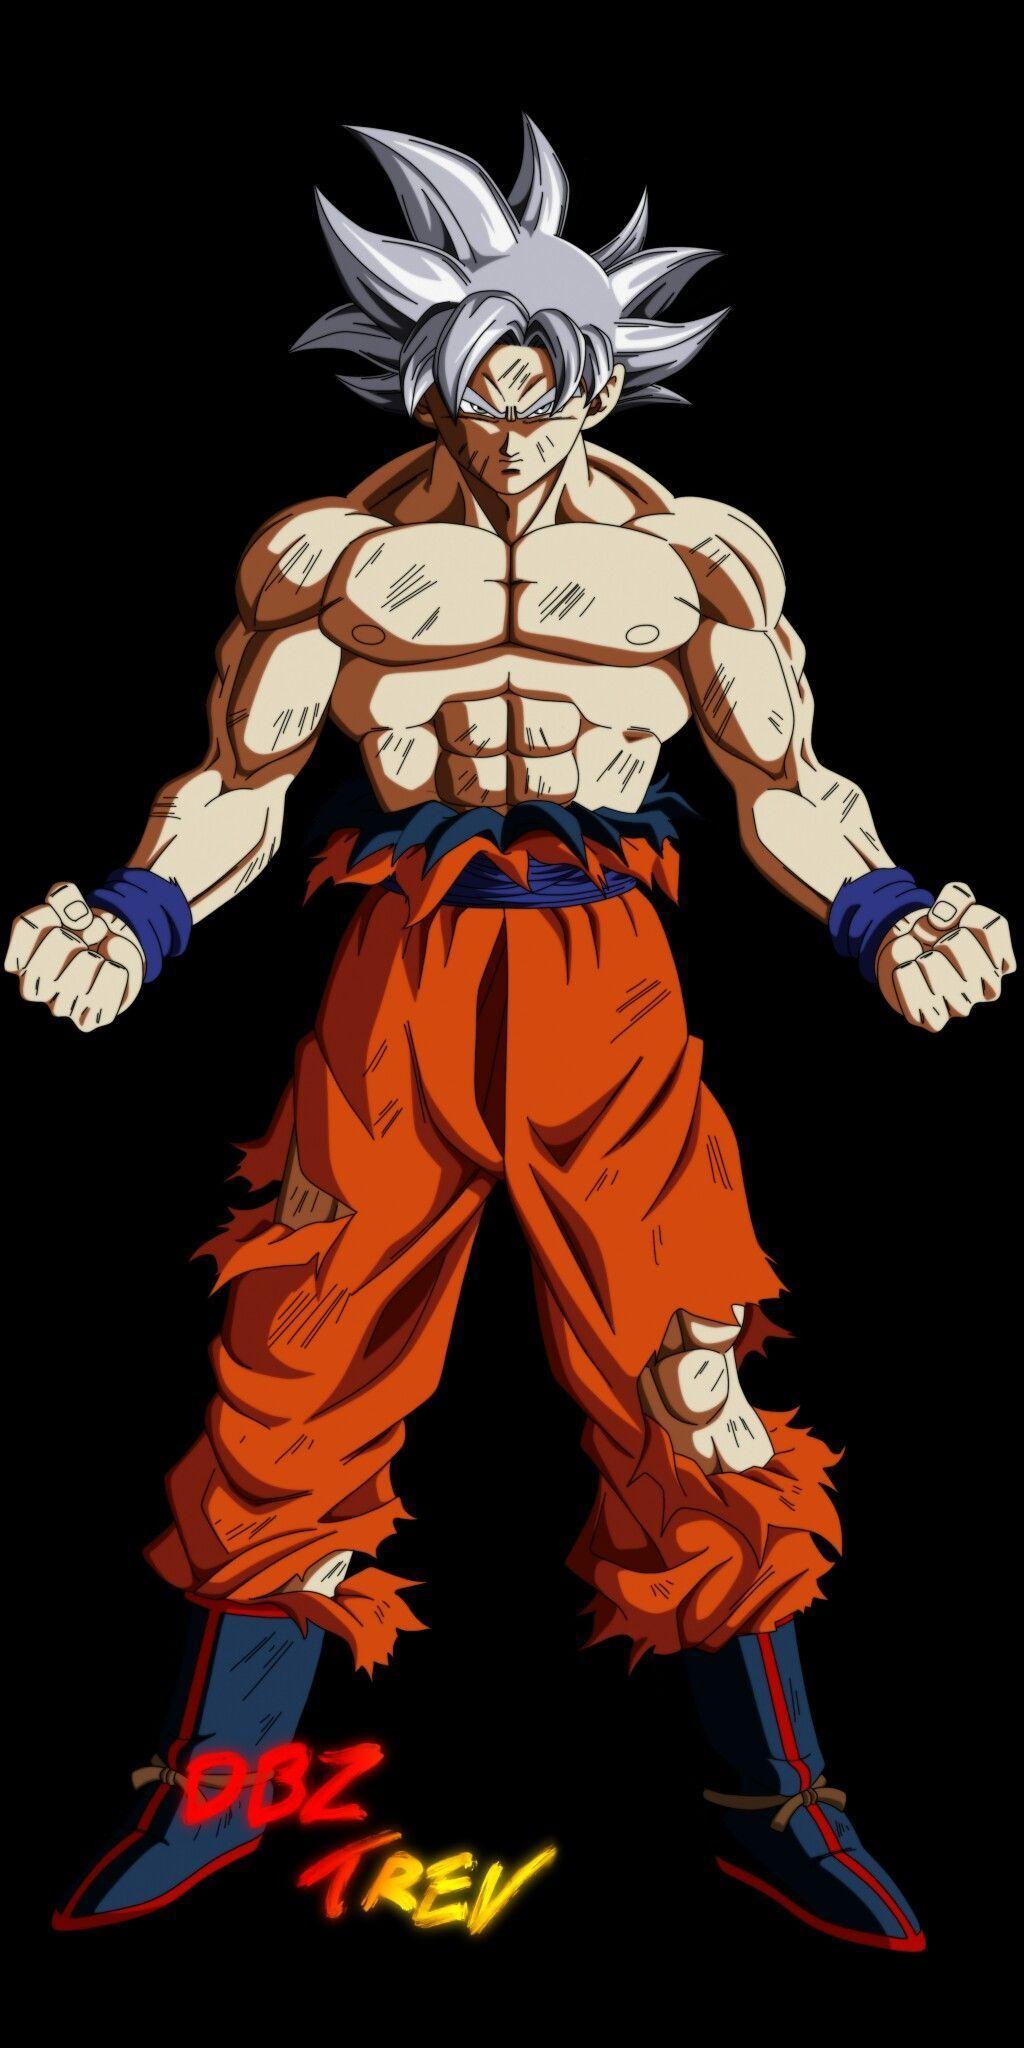 Goku Mastered Ultra Instinct Wallpapers - Wallpaper Cave